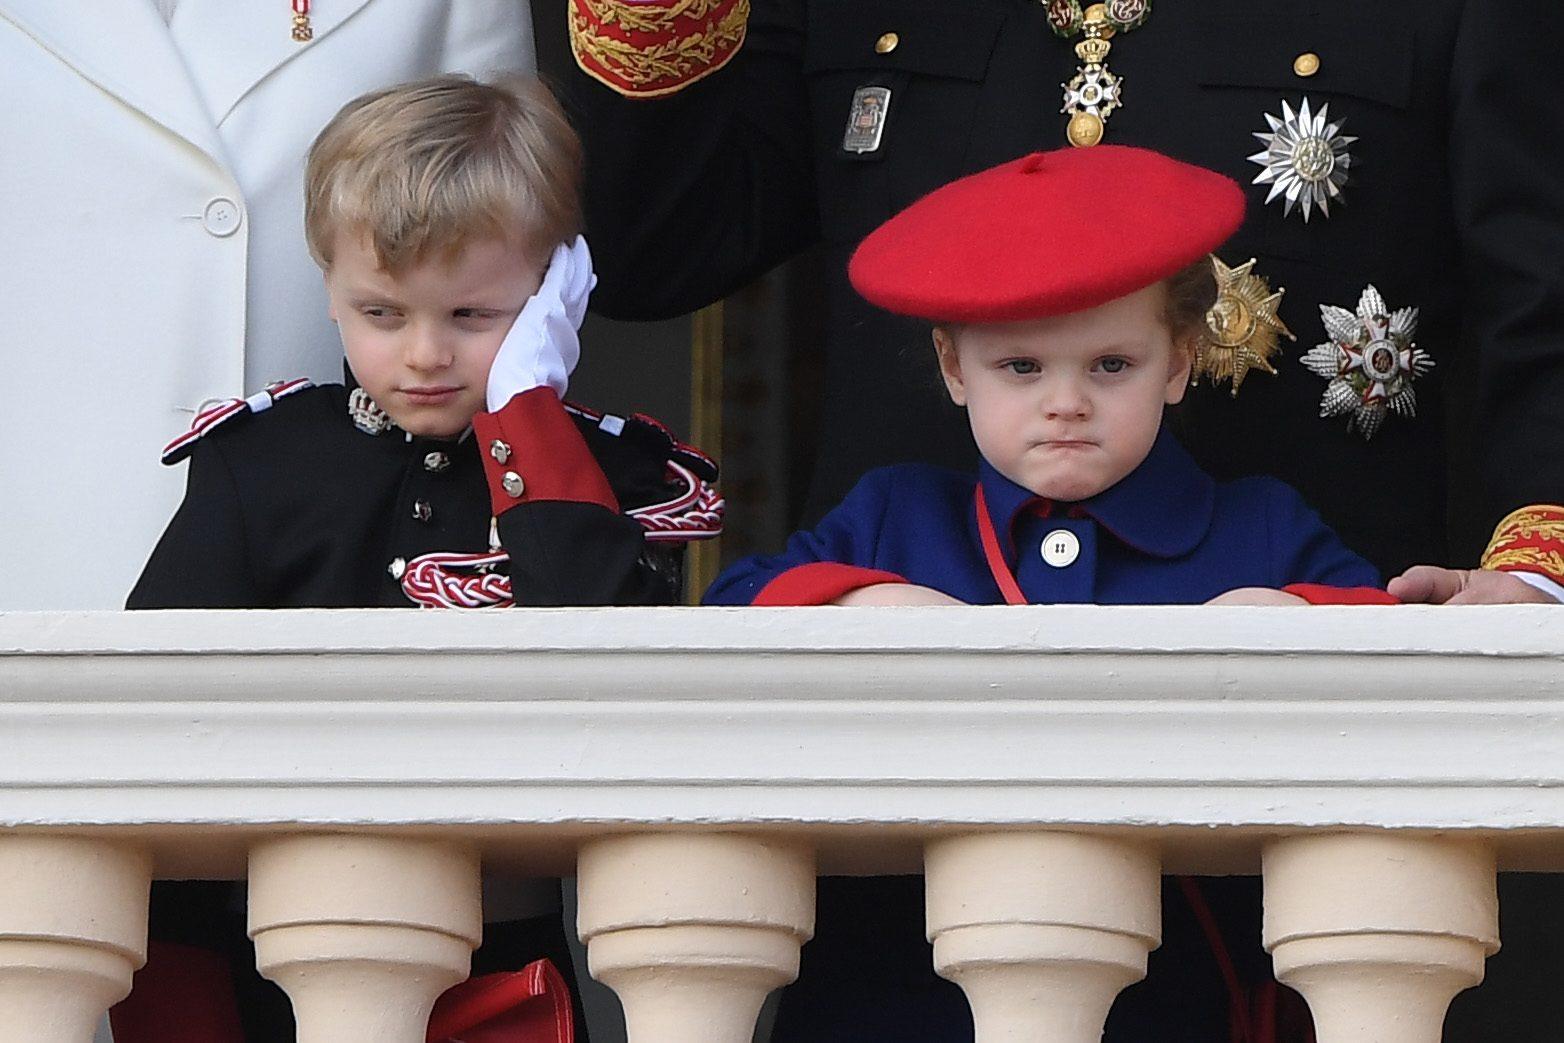 Prince Jacques of Monaco and Princess Gabriela of Monaco